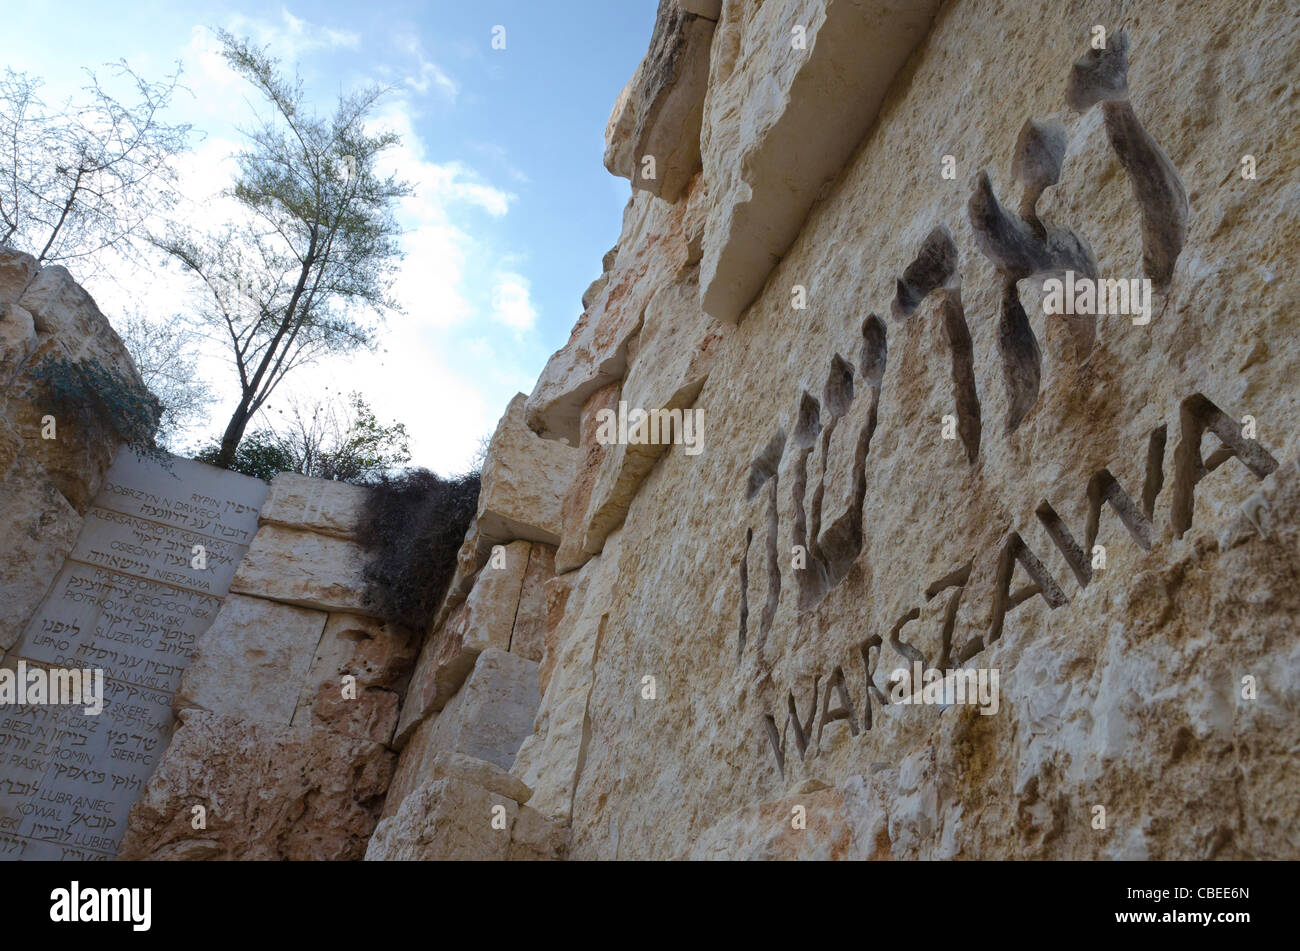 The Valley of Communitie. Yad Vashem Holocaust Memorial. Jerusalem. israel - Stock Image